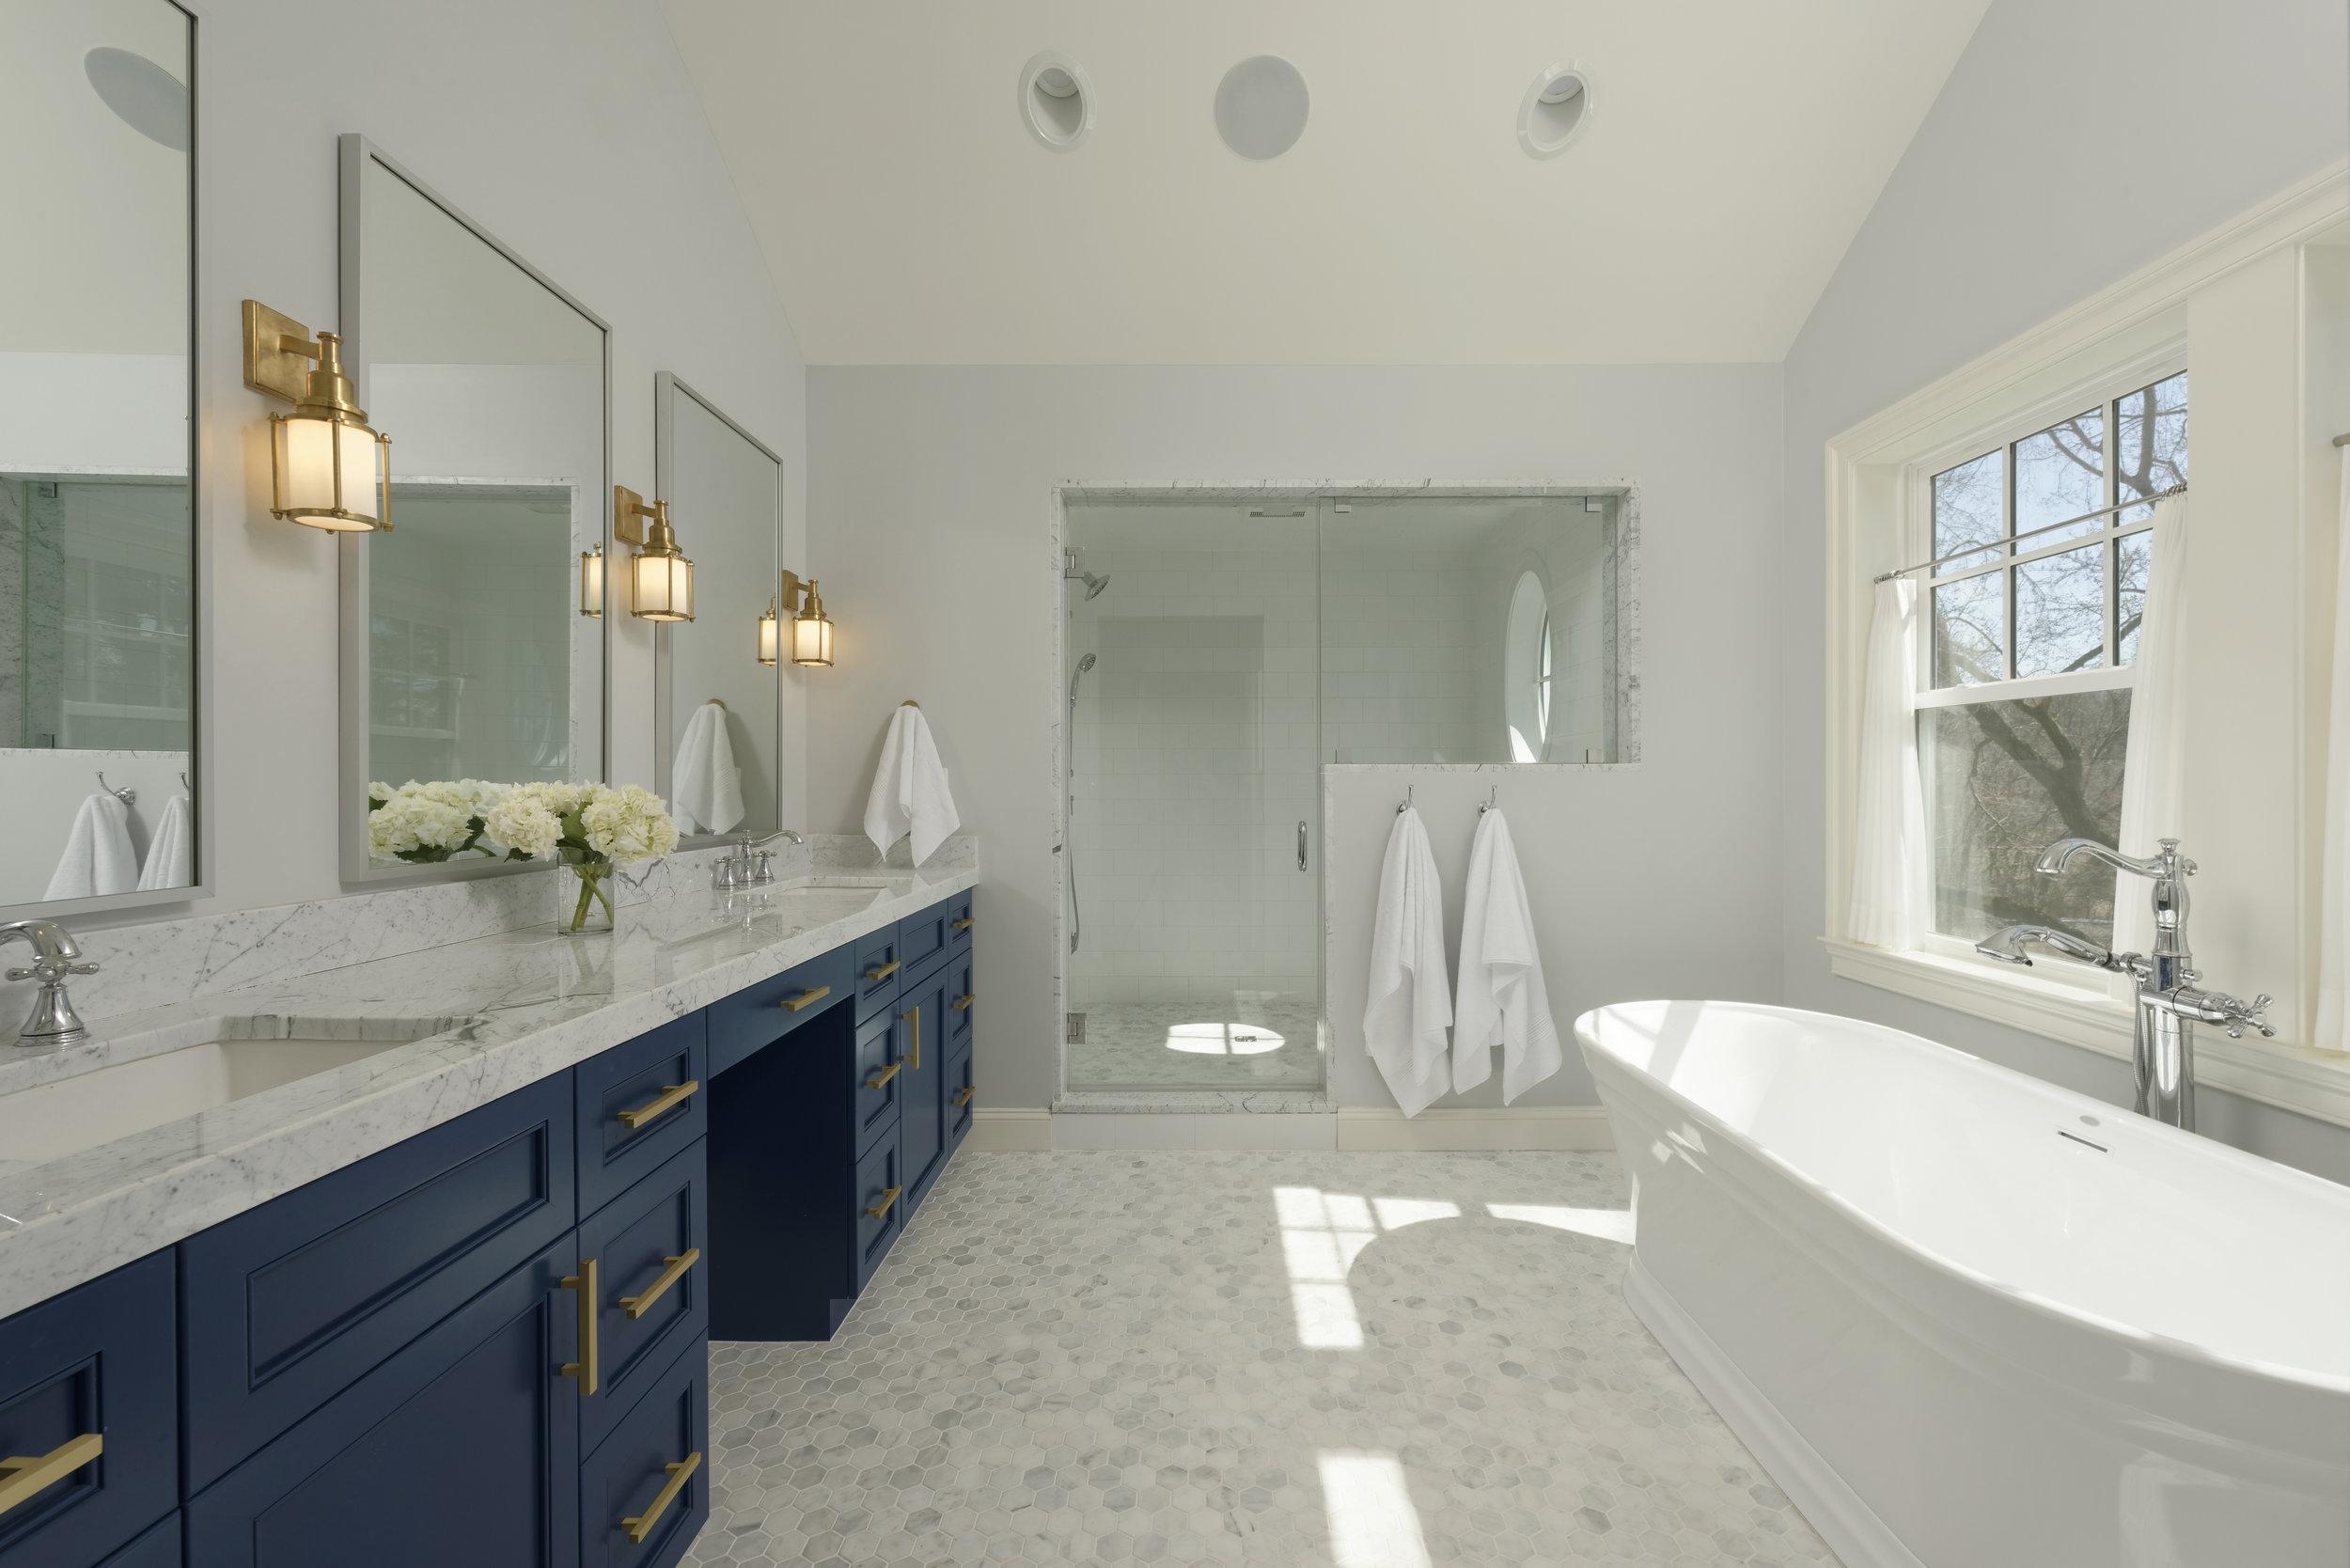 Meltzer High Res-Master Bathroom 2-D19045-5309.jpg